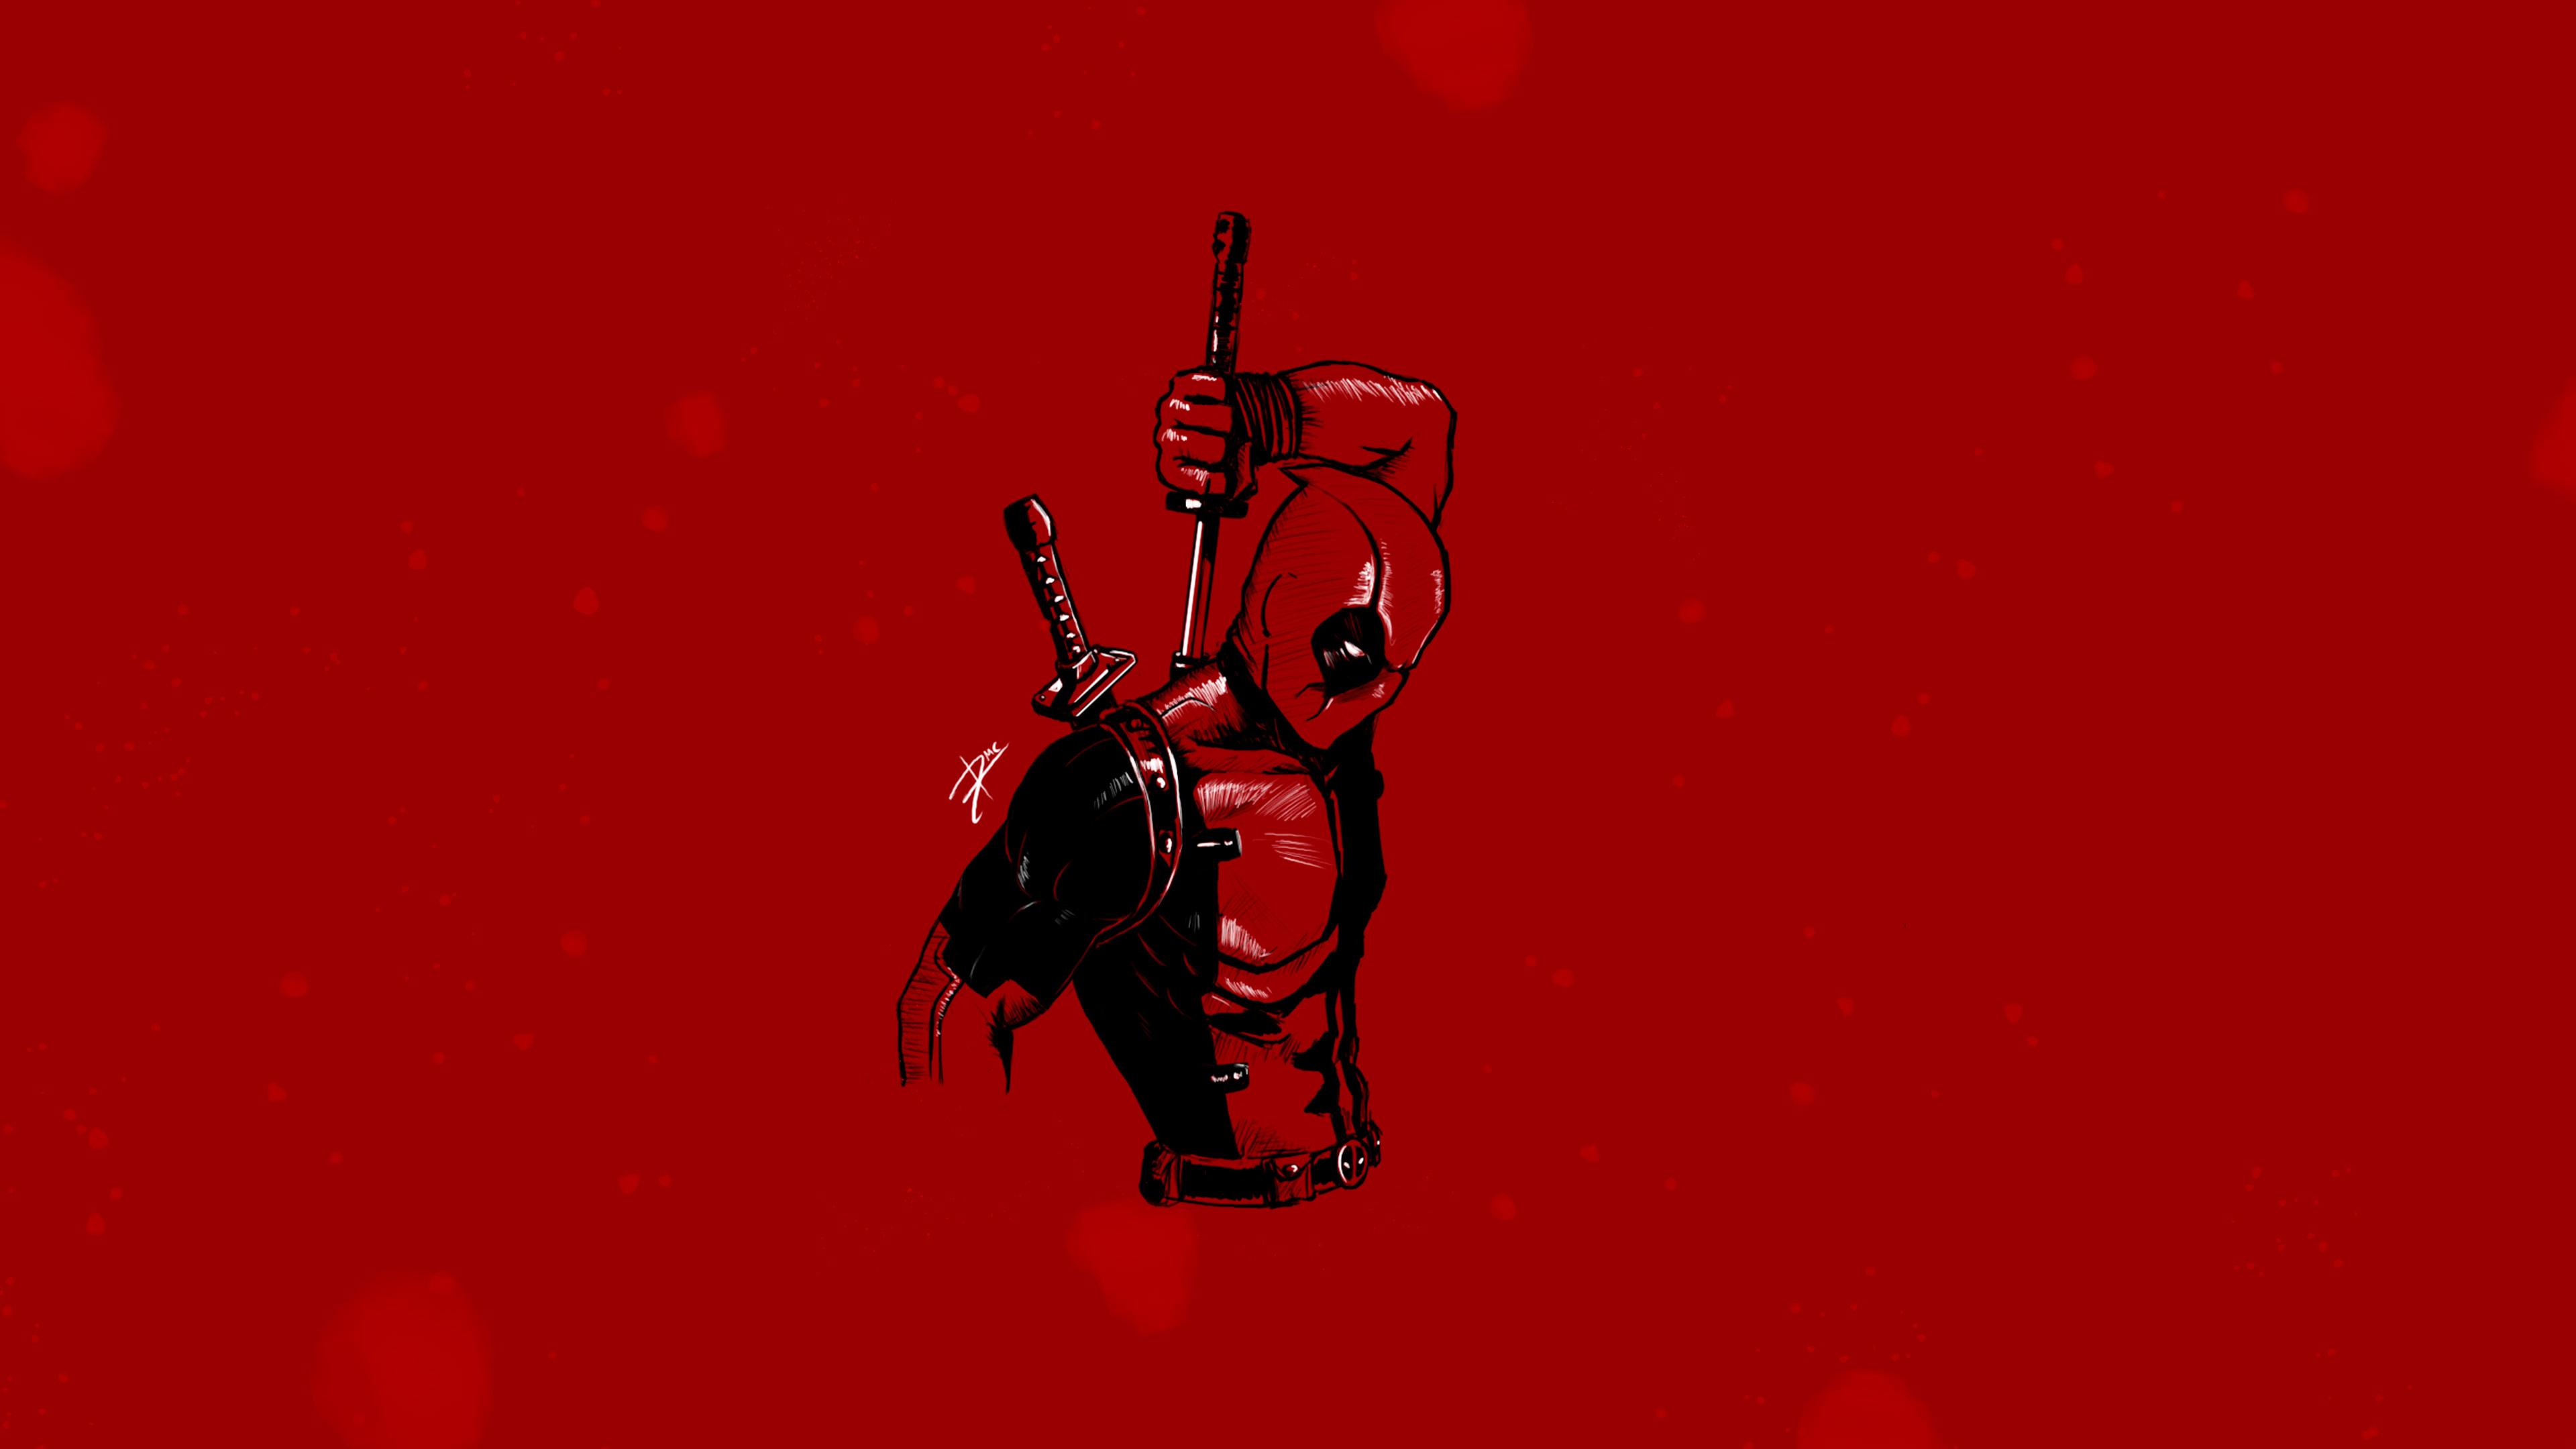 Deadpool Minimalist 4k Hd Superheroes 4k Wallpapers Images